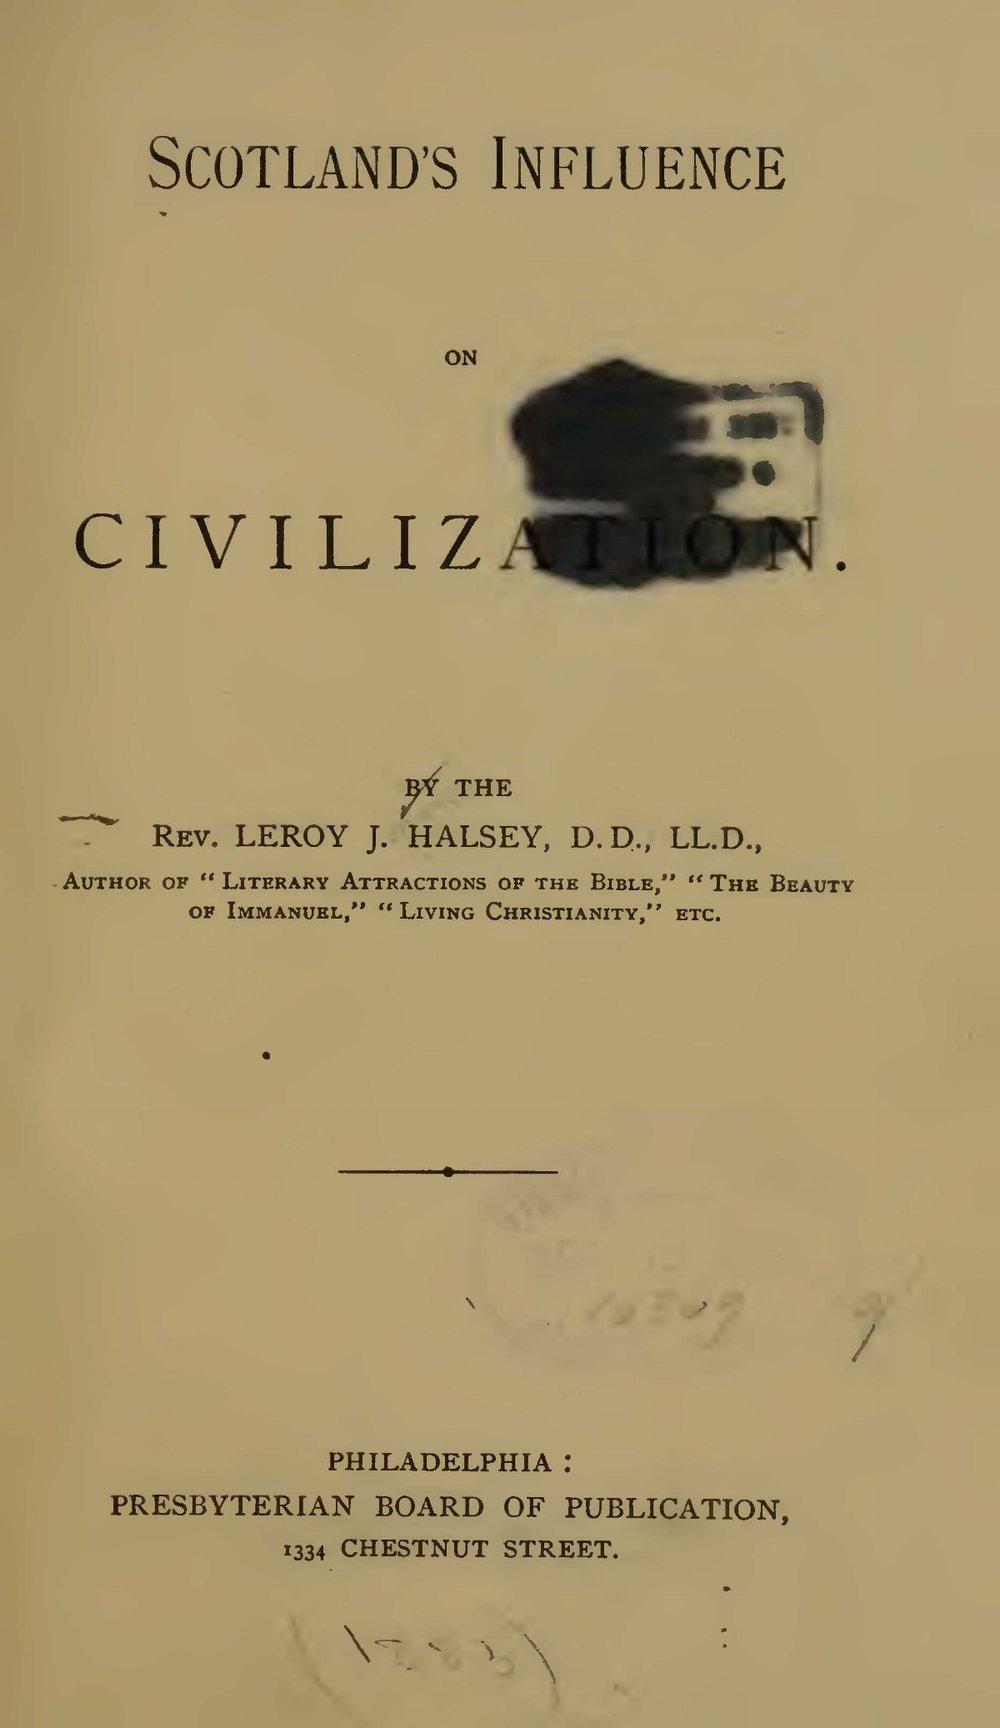 Halsey, Leroy Jones, Scotland's Influence on Civilization Title Page.jpg